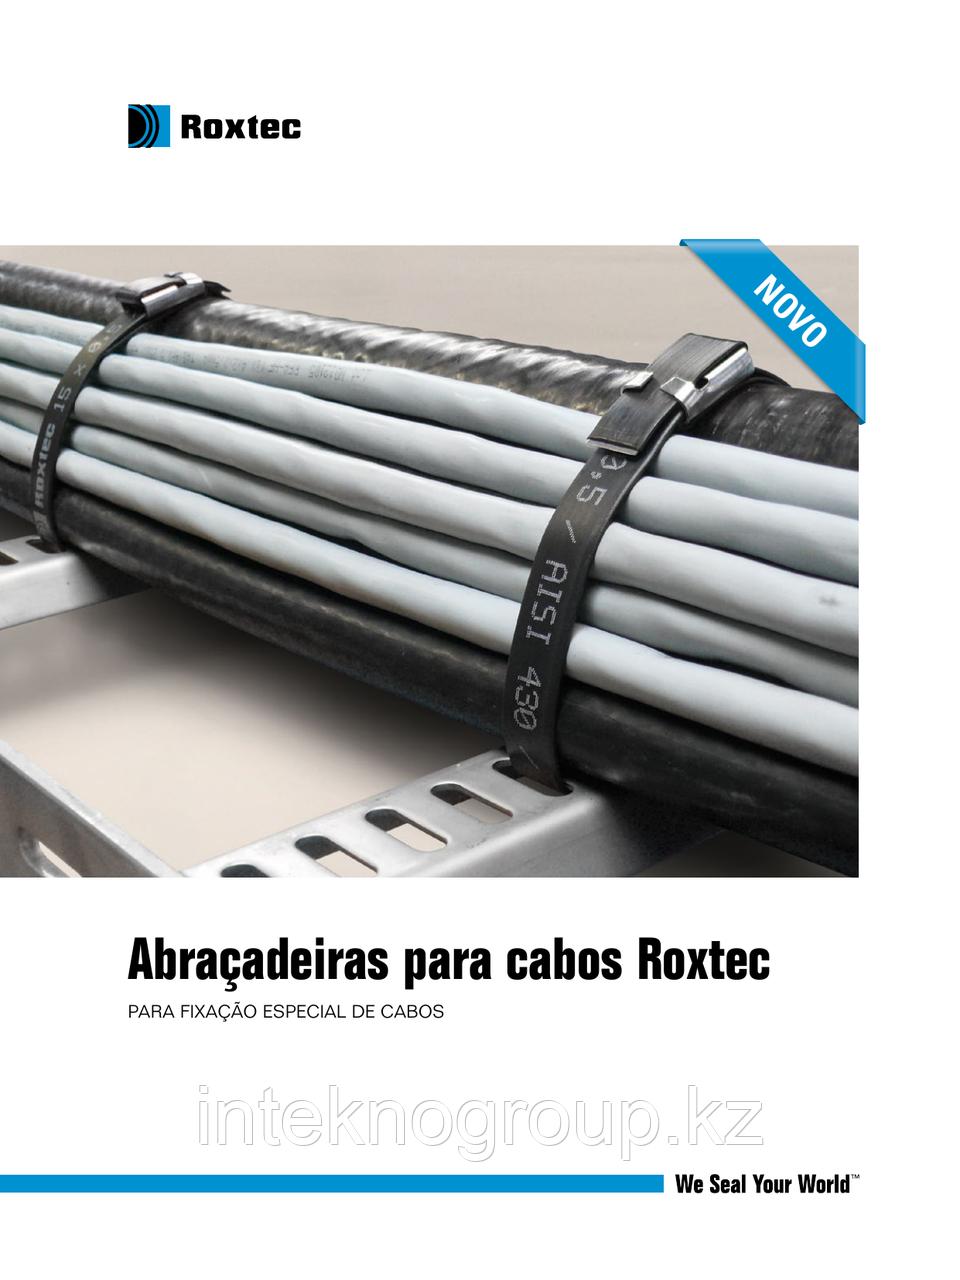 Roxtec Cable straps Strap 15x0,5 grey/galv. L=800 mm